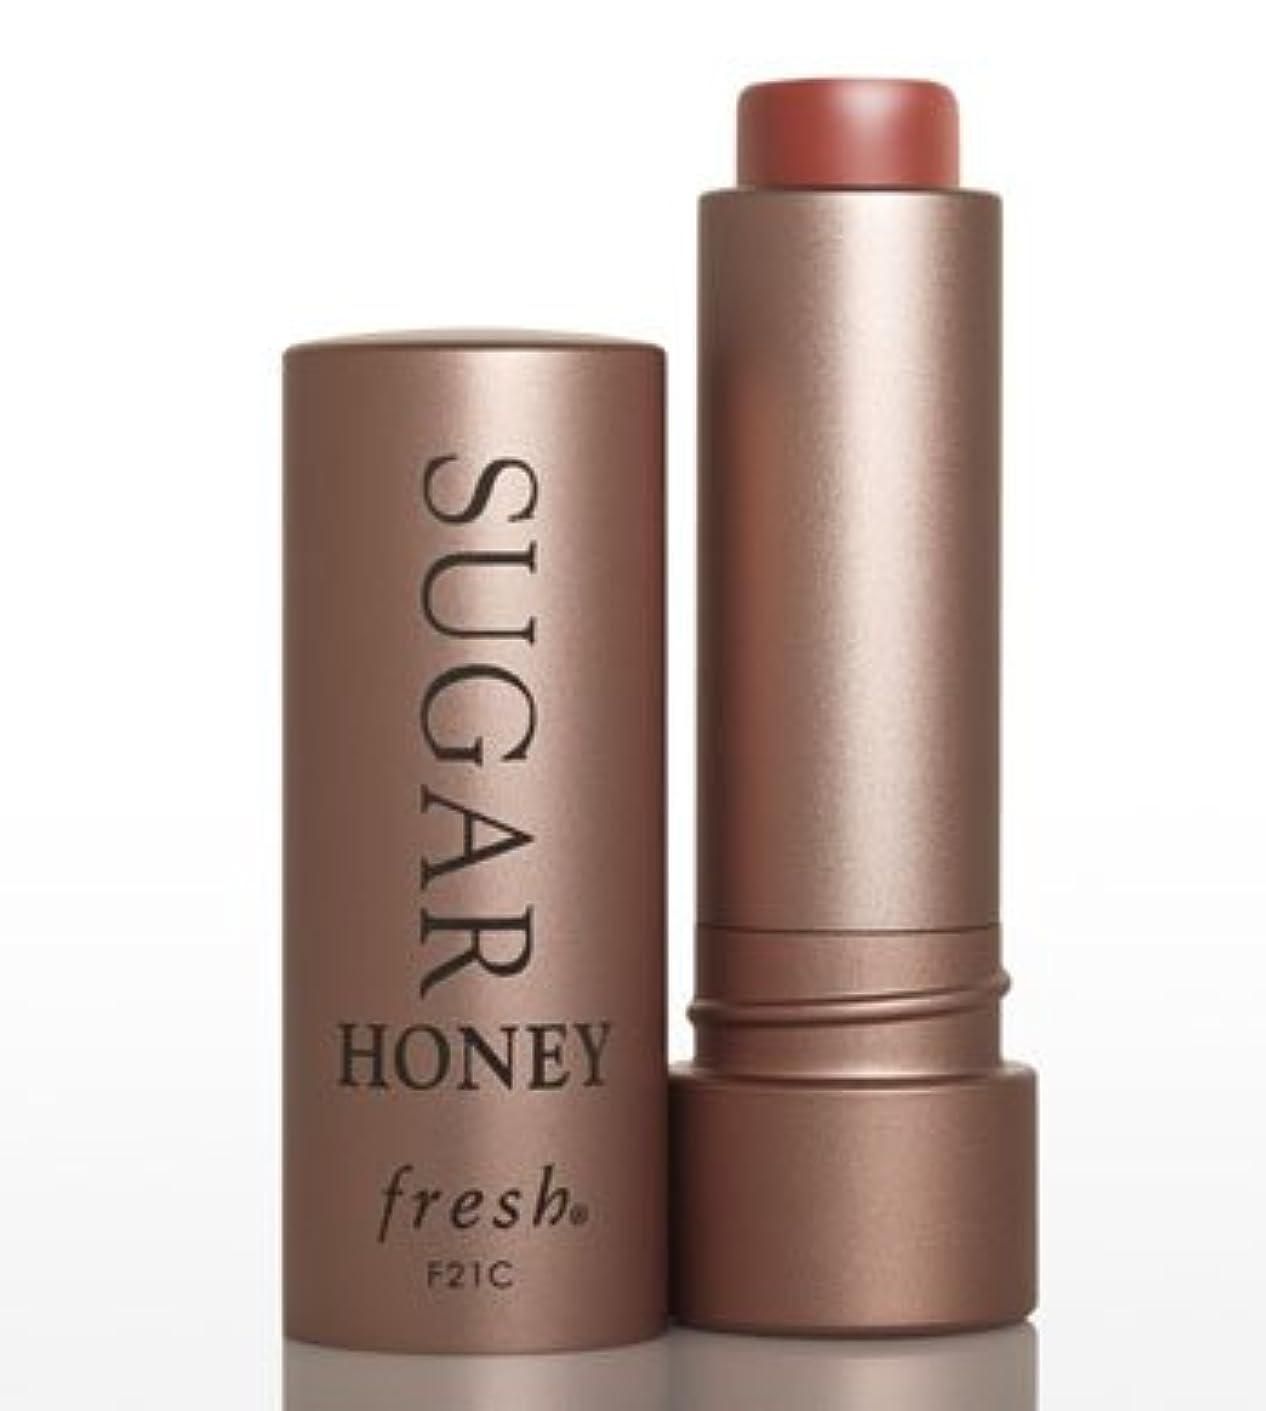 Fresh SUGAR Honey TINTED LIP TREATMENT SPF15(フレッシュ シュガー ハニー ティンテッド リップ トリートメント SPF15) 0.15 oz (4.3g)